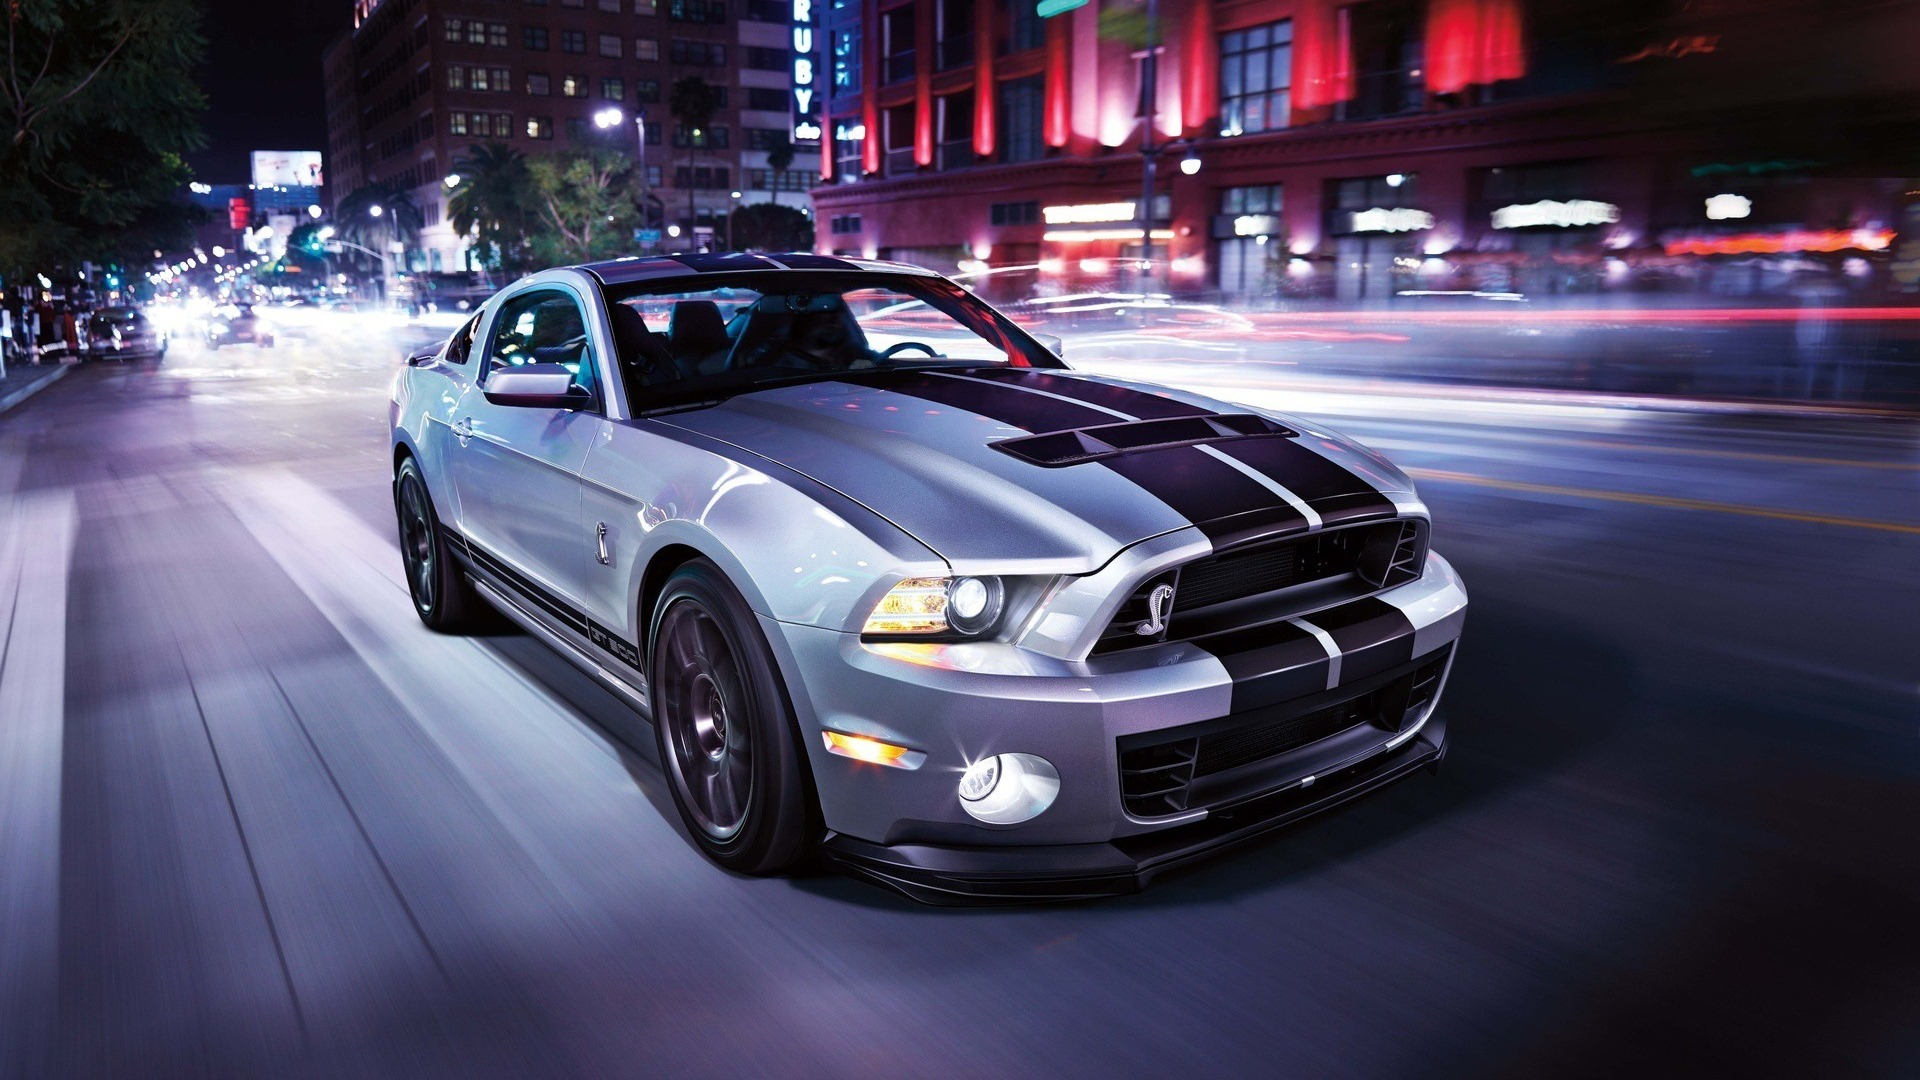 Download Download Best Car In The World 2015 HD Desktop Wallpaper 1920x1080